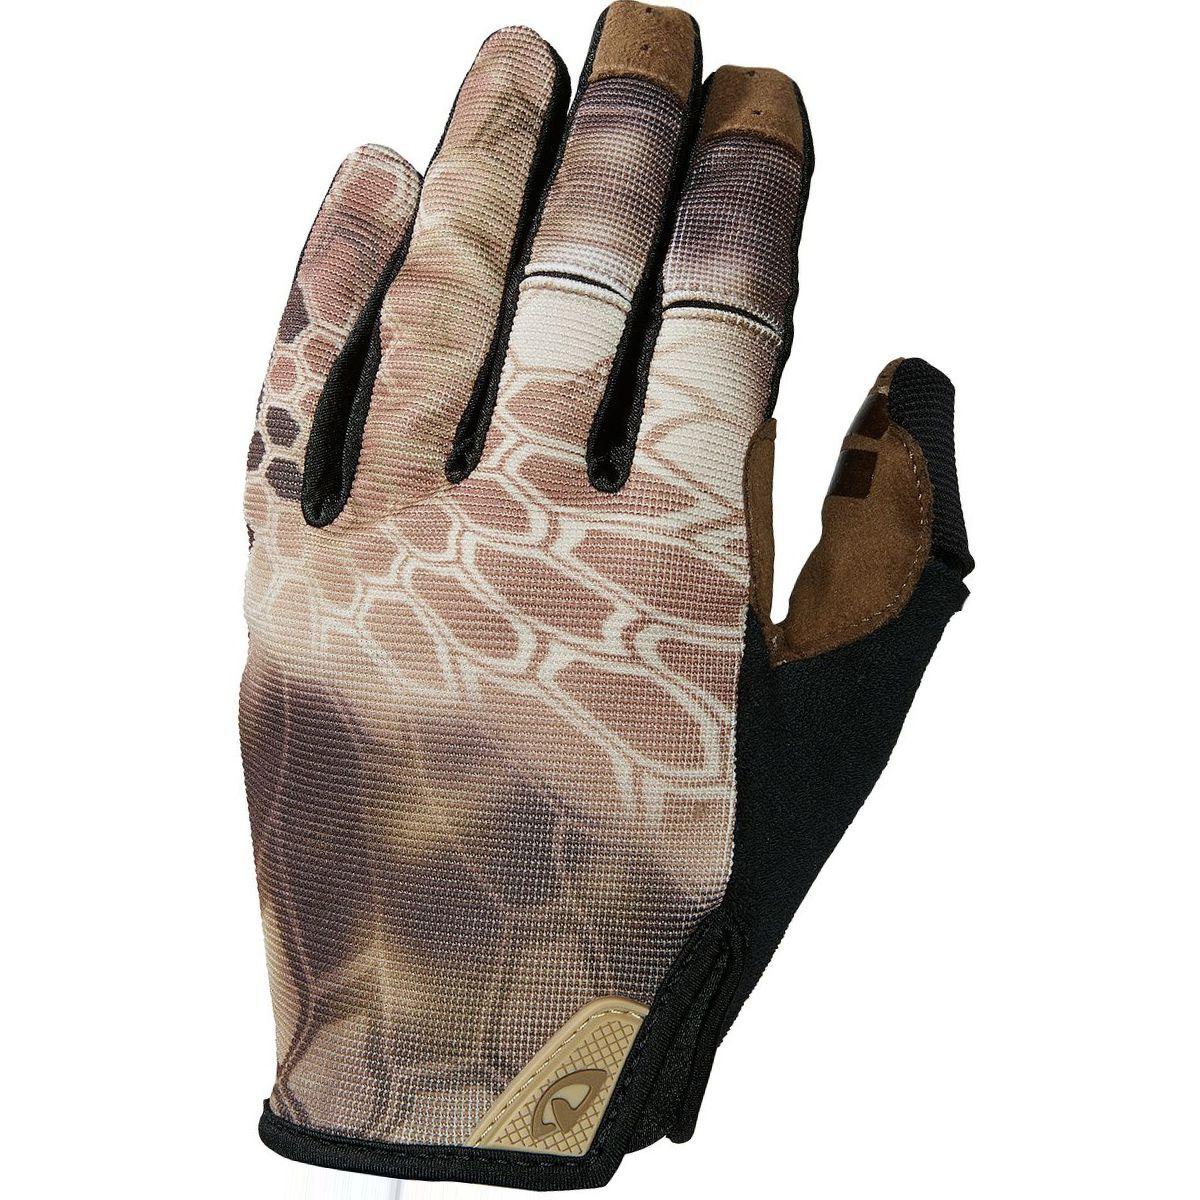 Giro DND Glove - Men's